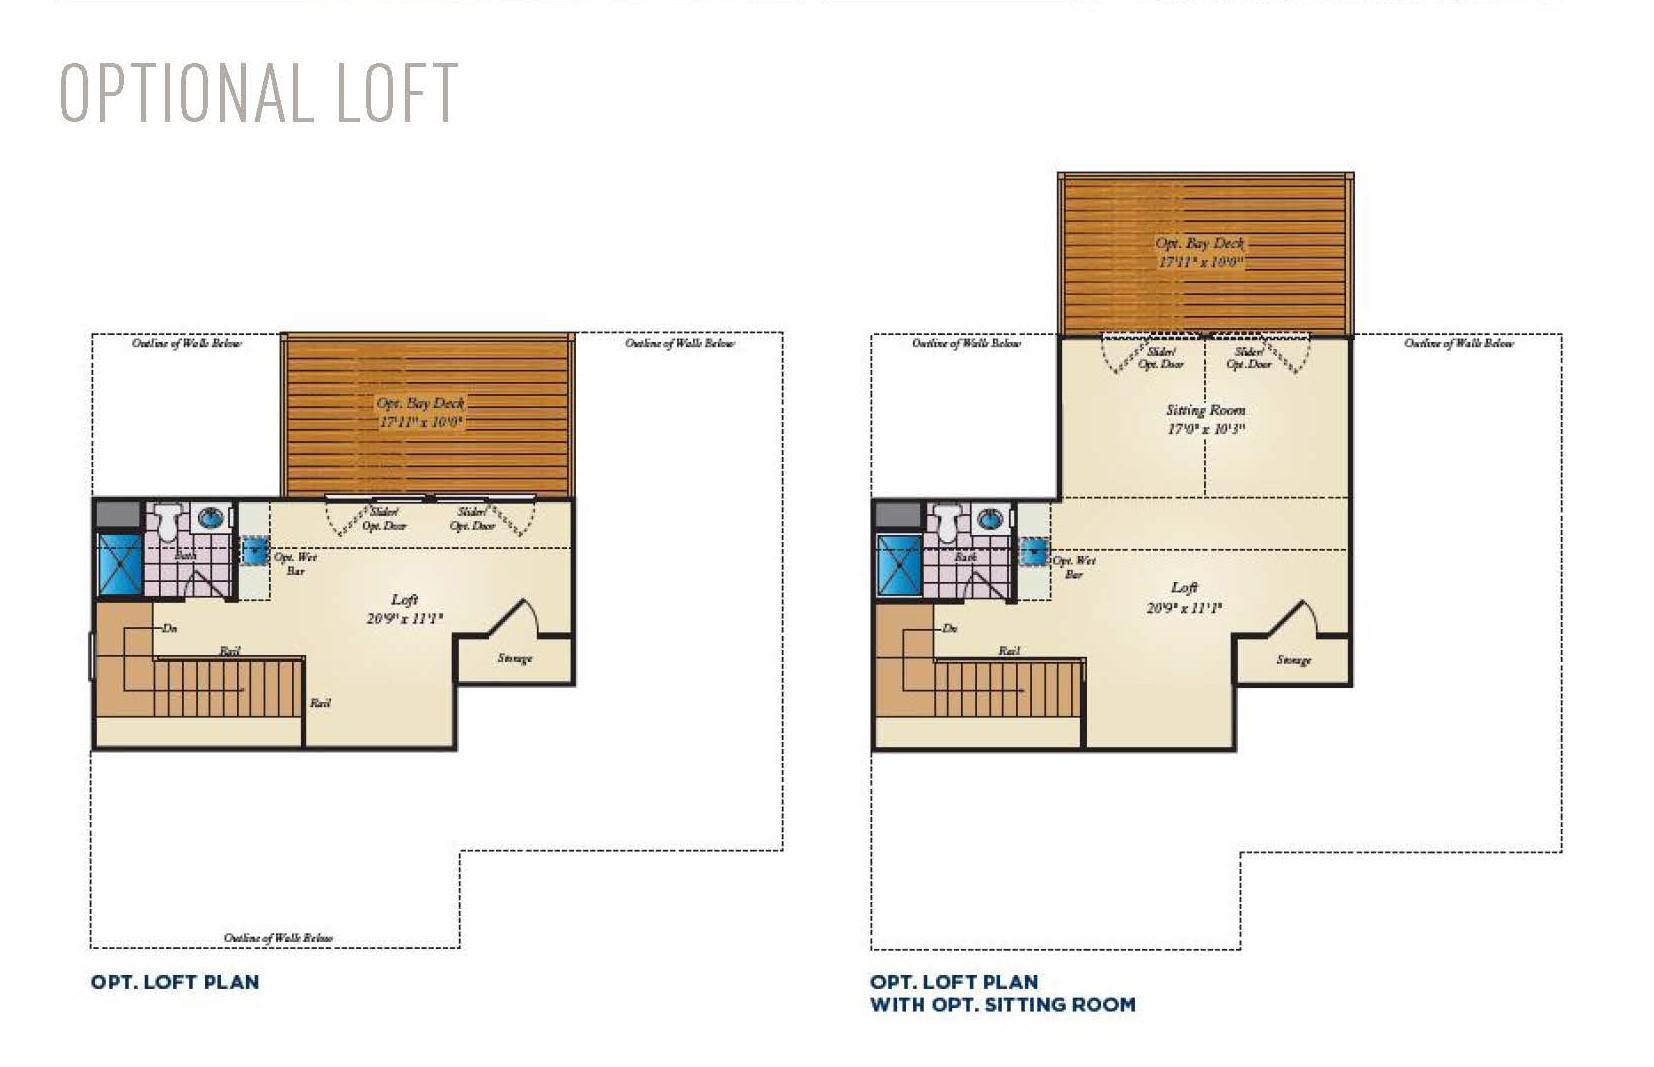 Optional Loft. Seahawk New Home Floor Plan